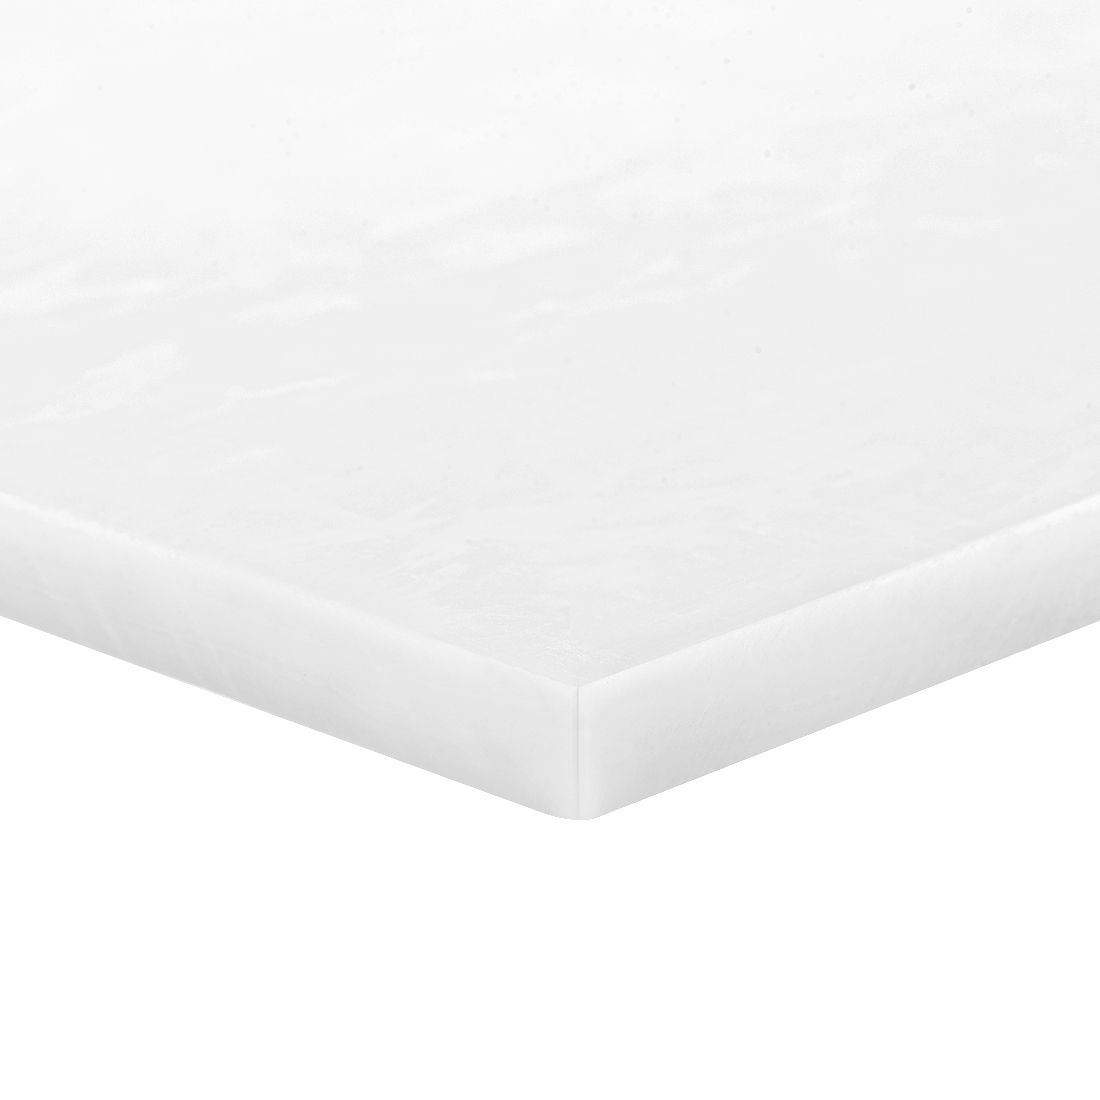 Acetal POM Sheet Polyoxymethylene Plate Sheet 200 x 250 x 6mm White